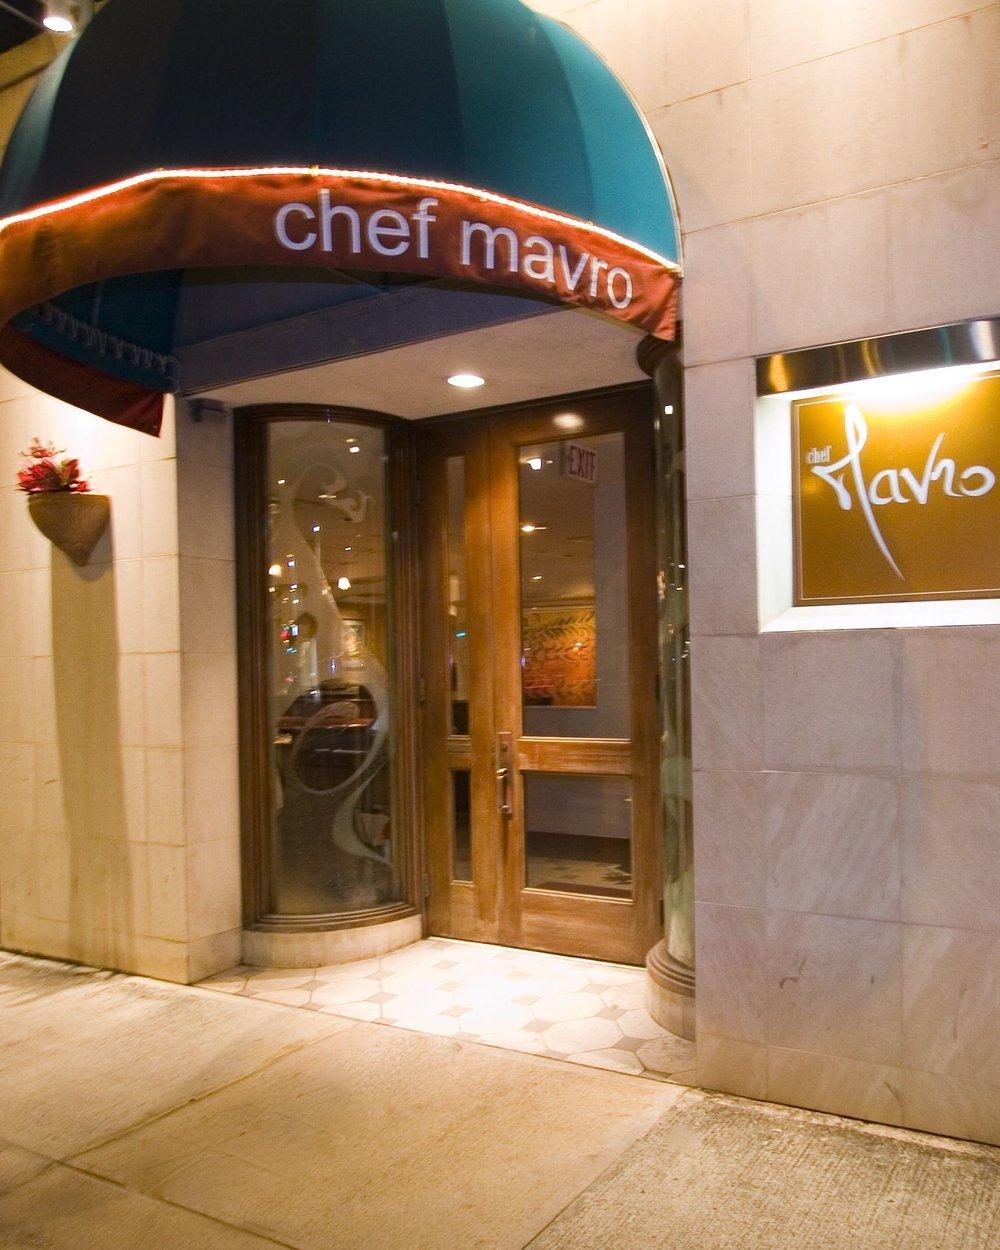 Chef Mavro restaurant front.jpg